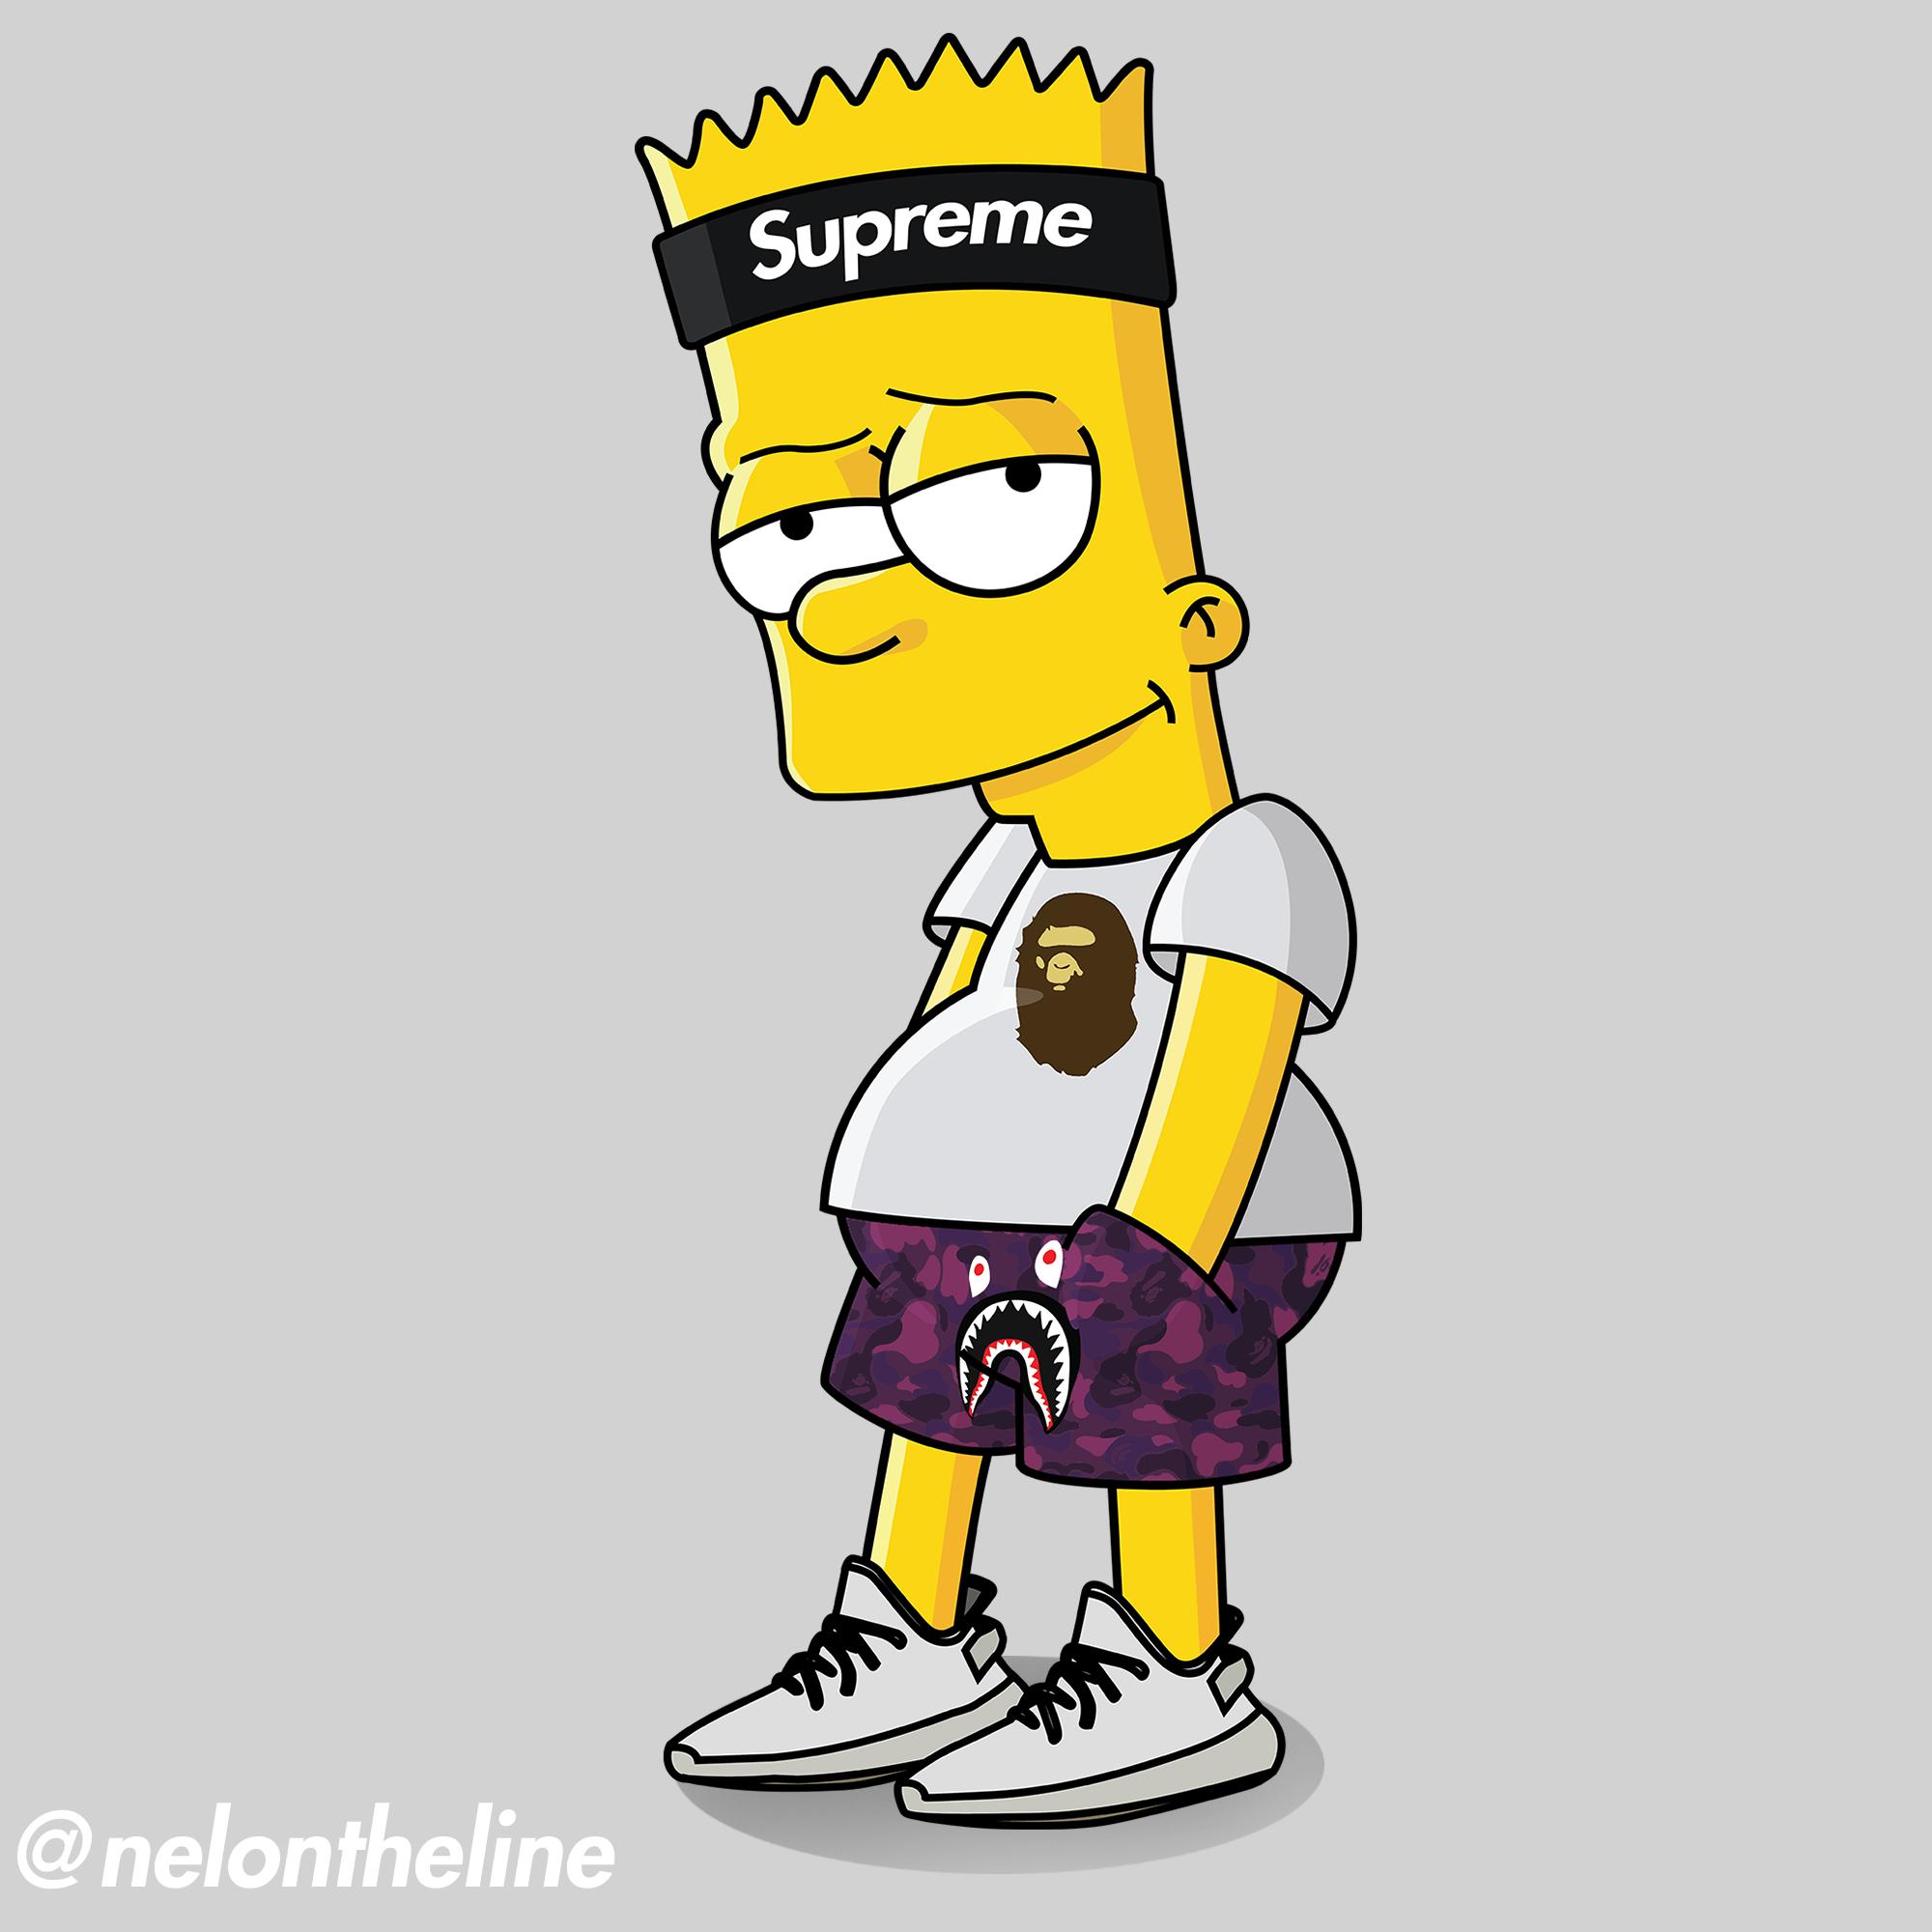 Bart simpson supreme clipart clipart freeuse stock Bart Simpson Hypebeasted #supreme #bape #yeezyboost #hypebeast | The ... clipart freeuse stock